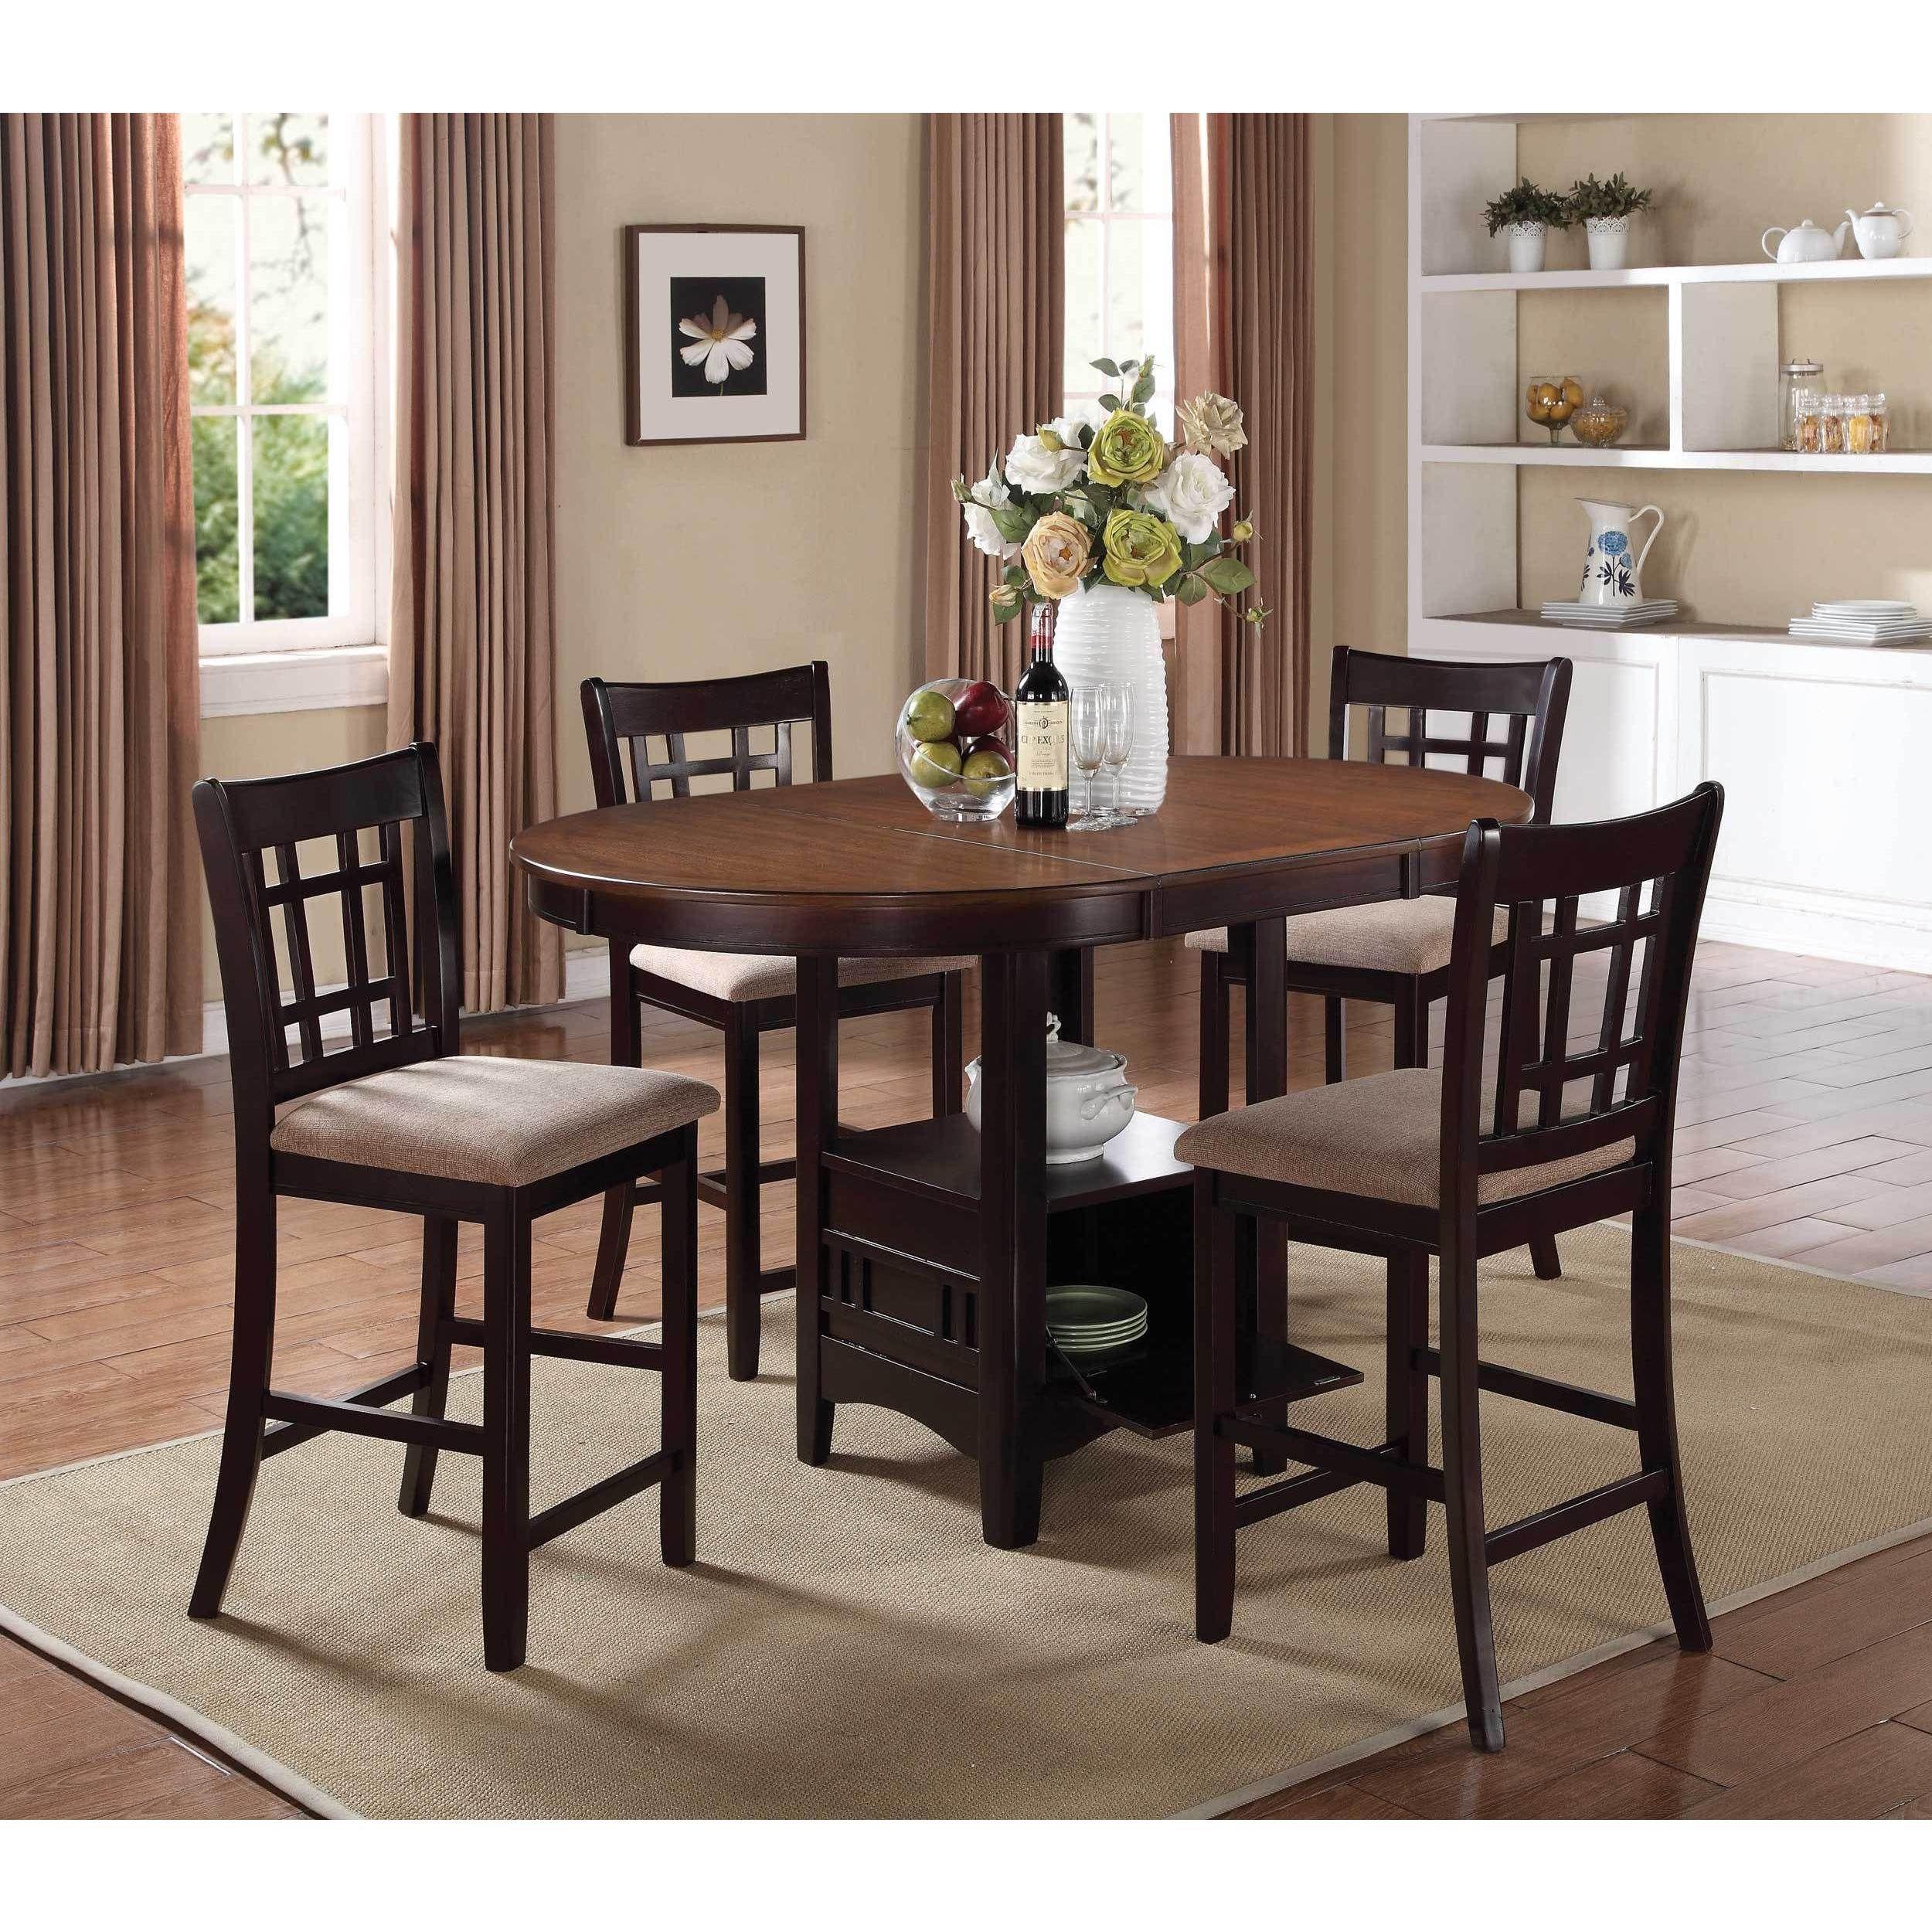 Our Best Dining Room & Bar Furniture Deals